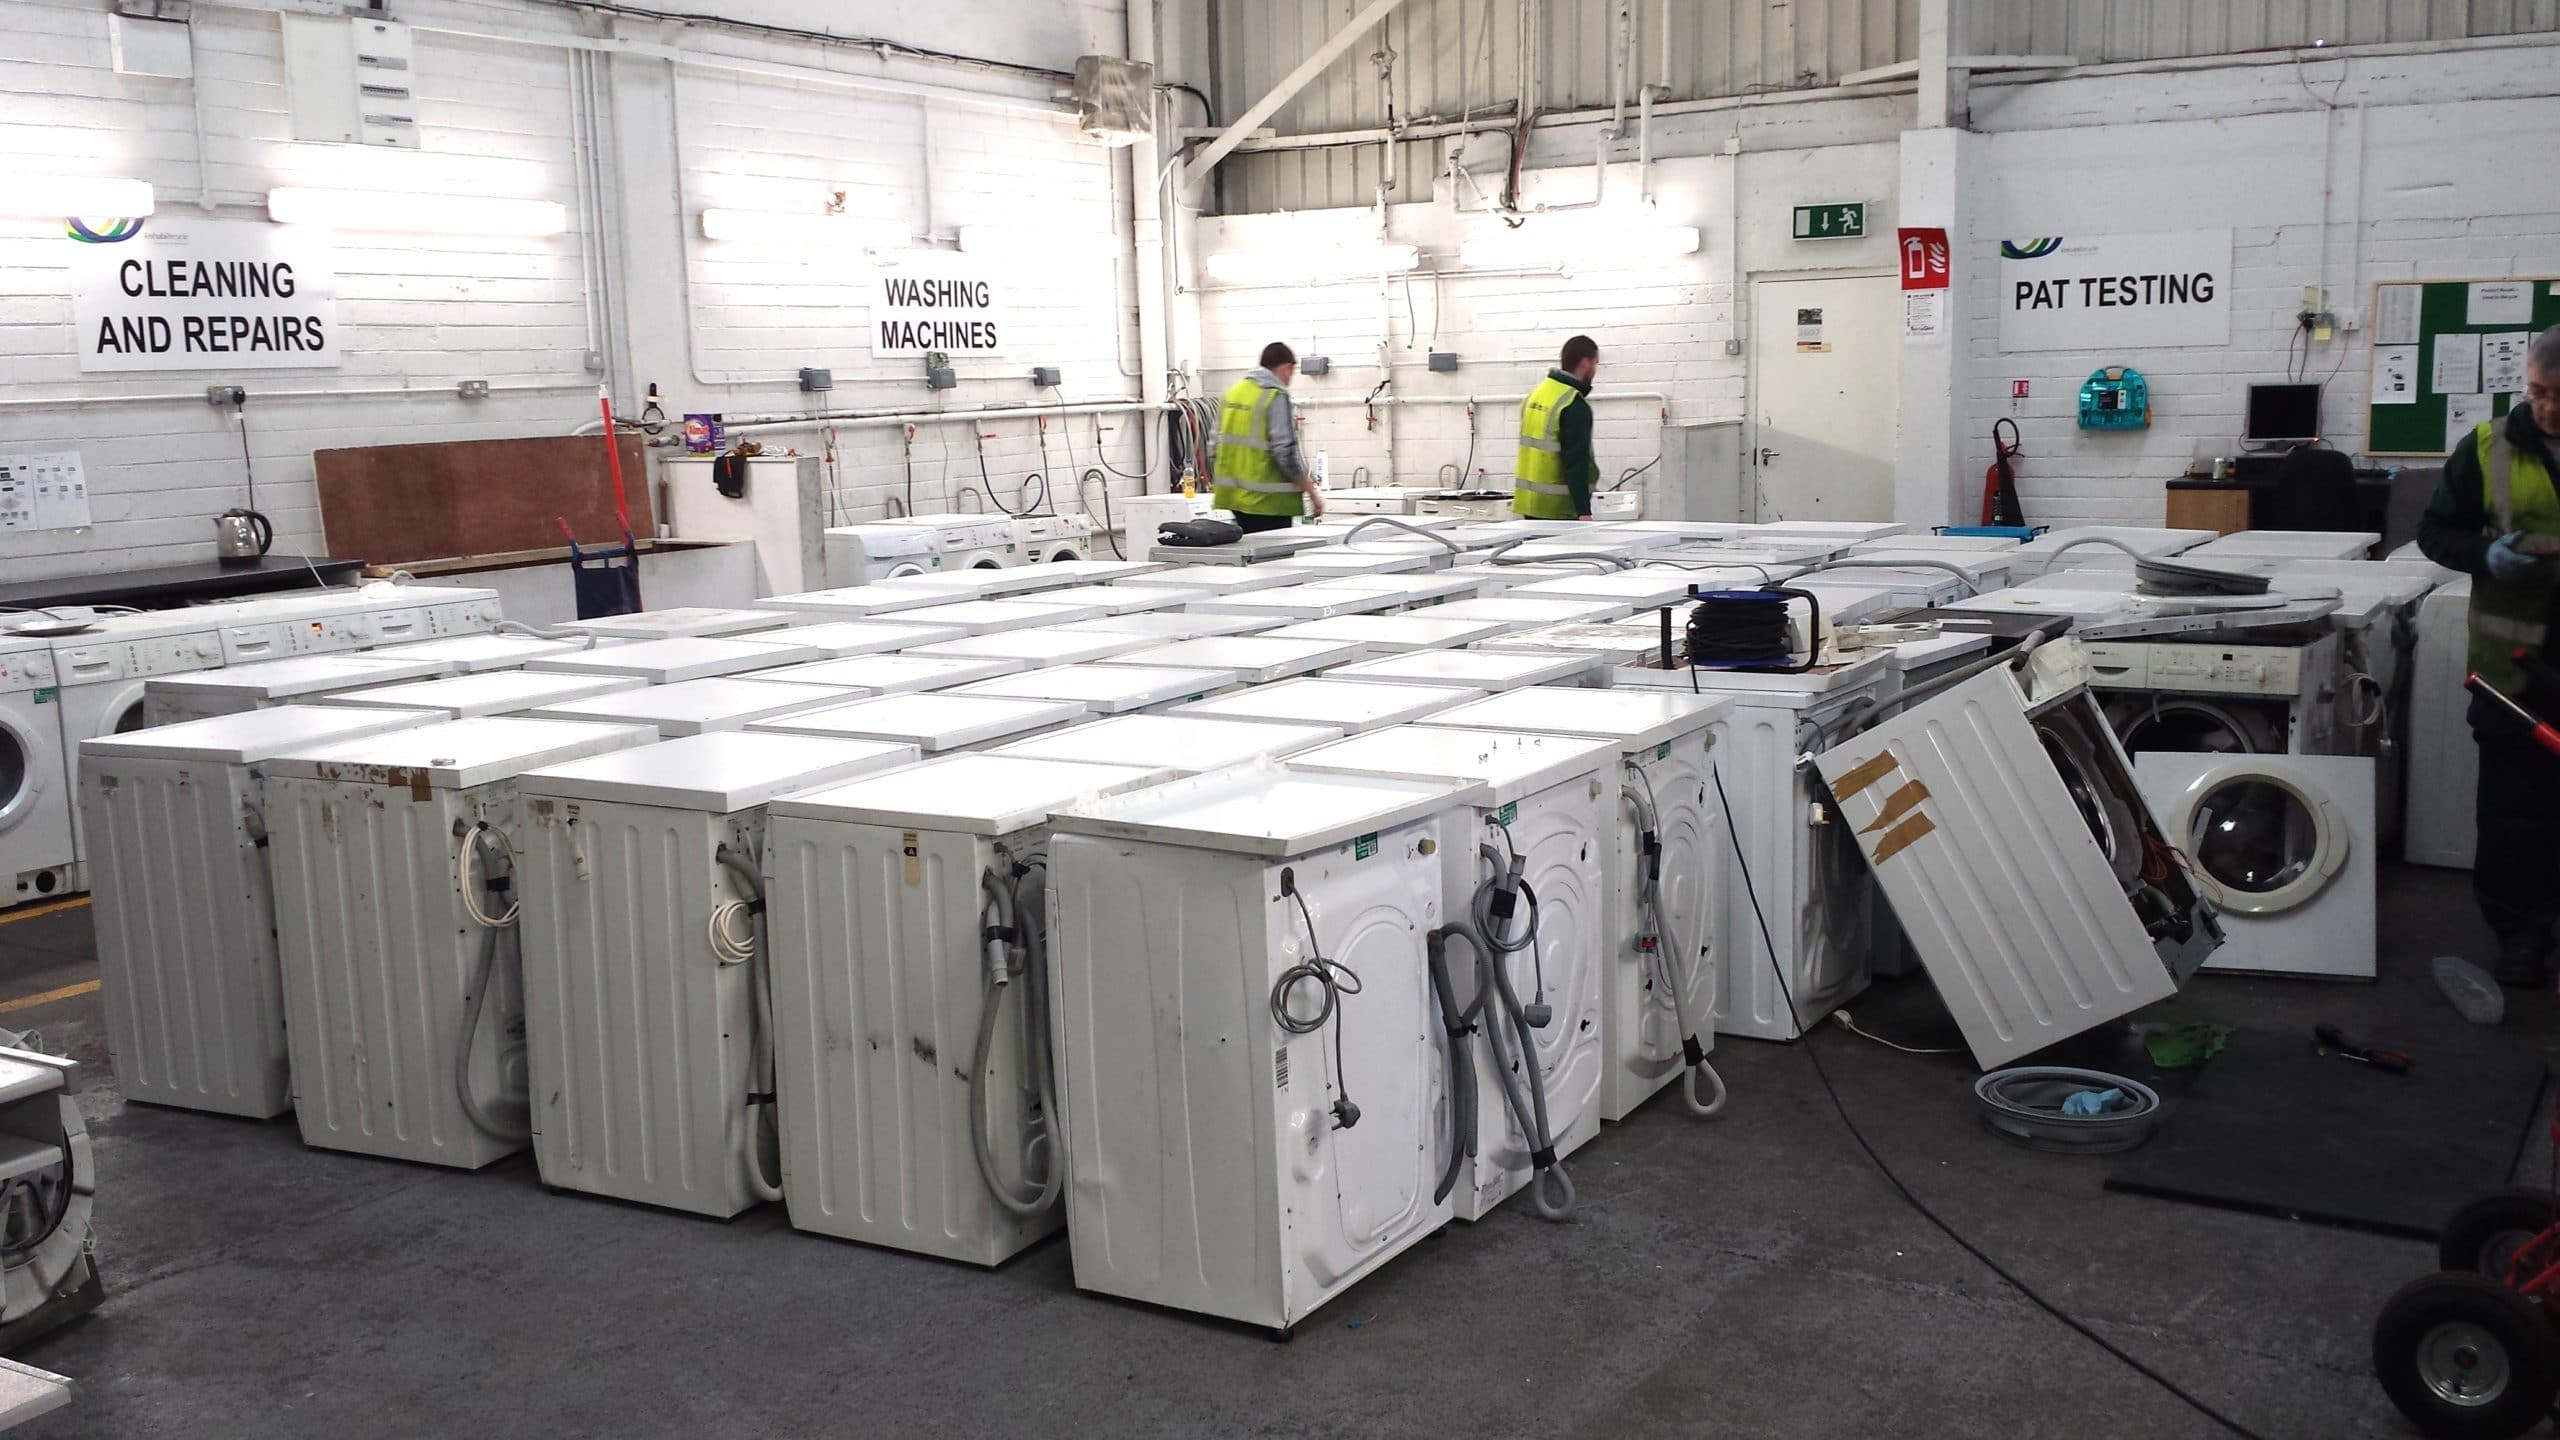 Belgian region sets re-use target for electricals